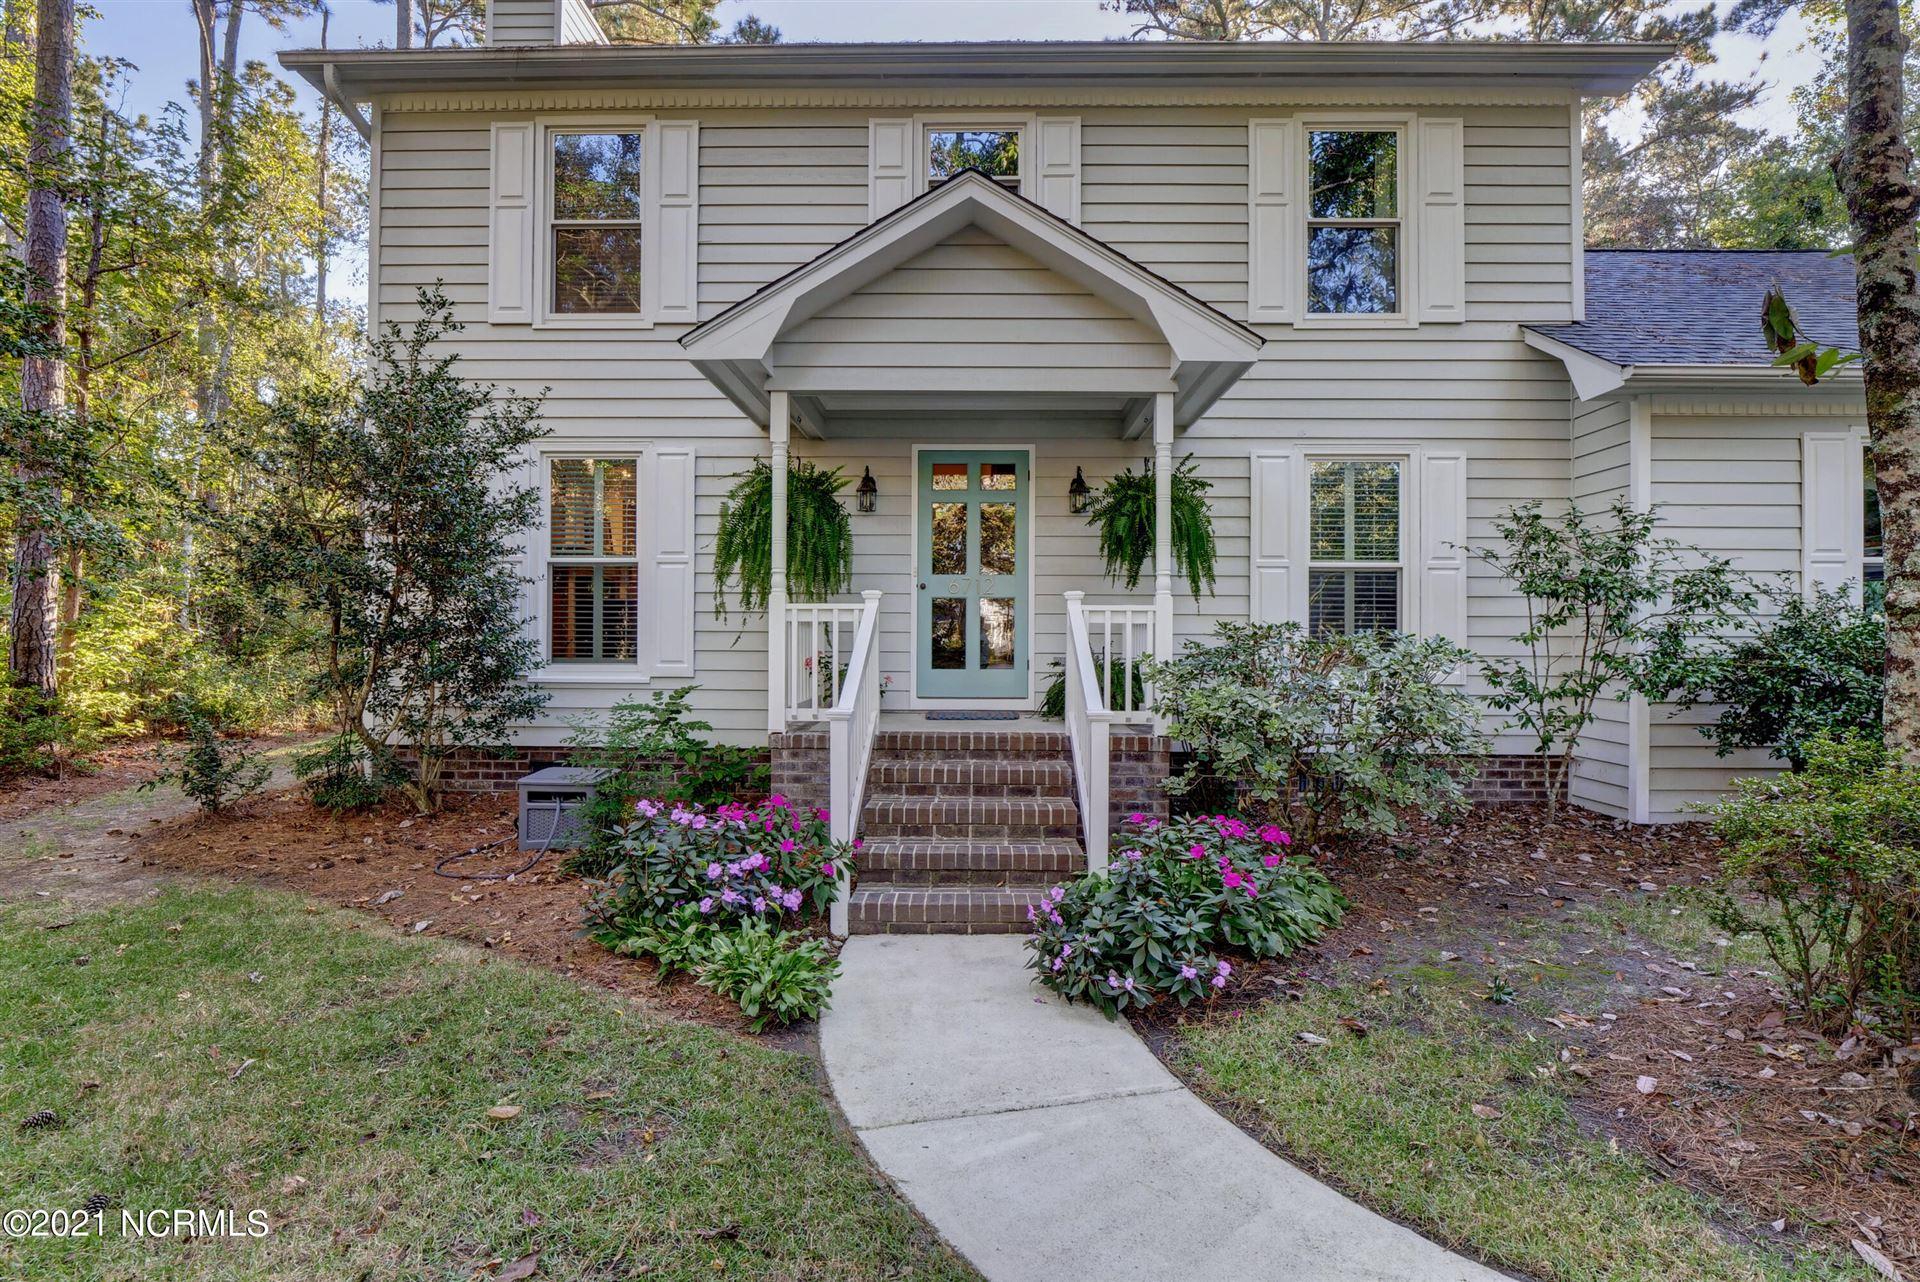 Photo of 6712 Piedmont Place, Wilmington, NC 28411 (MLS # 100295608)